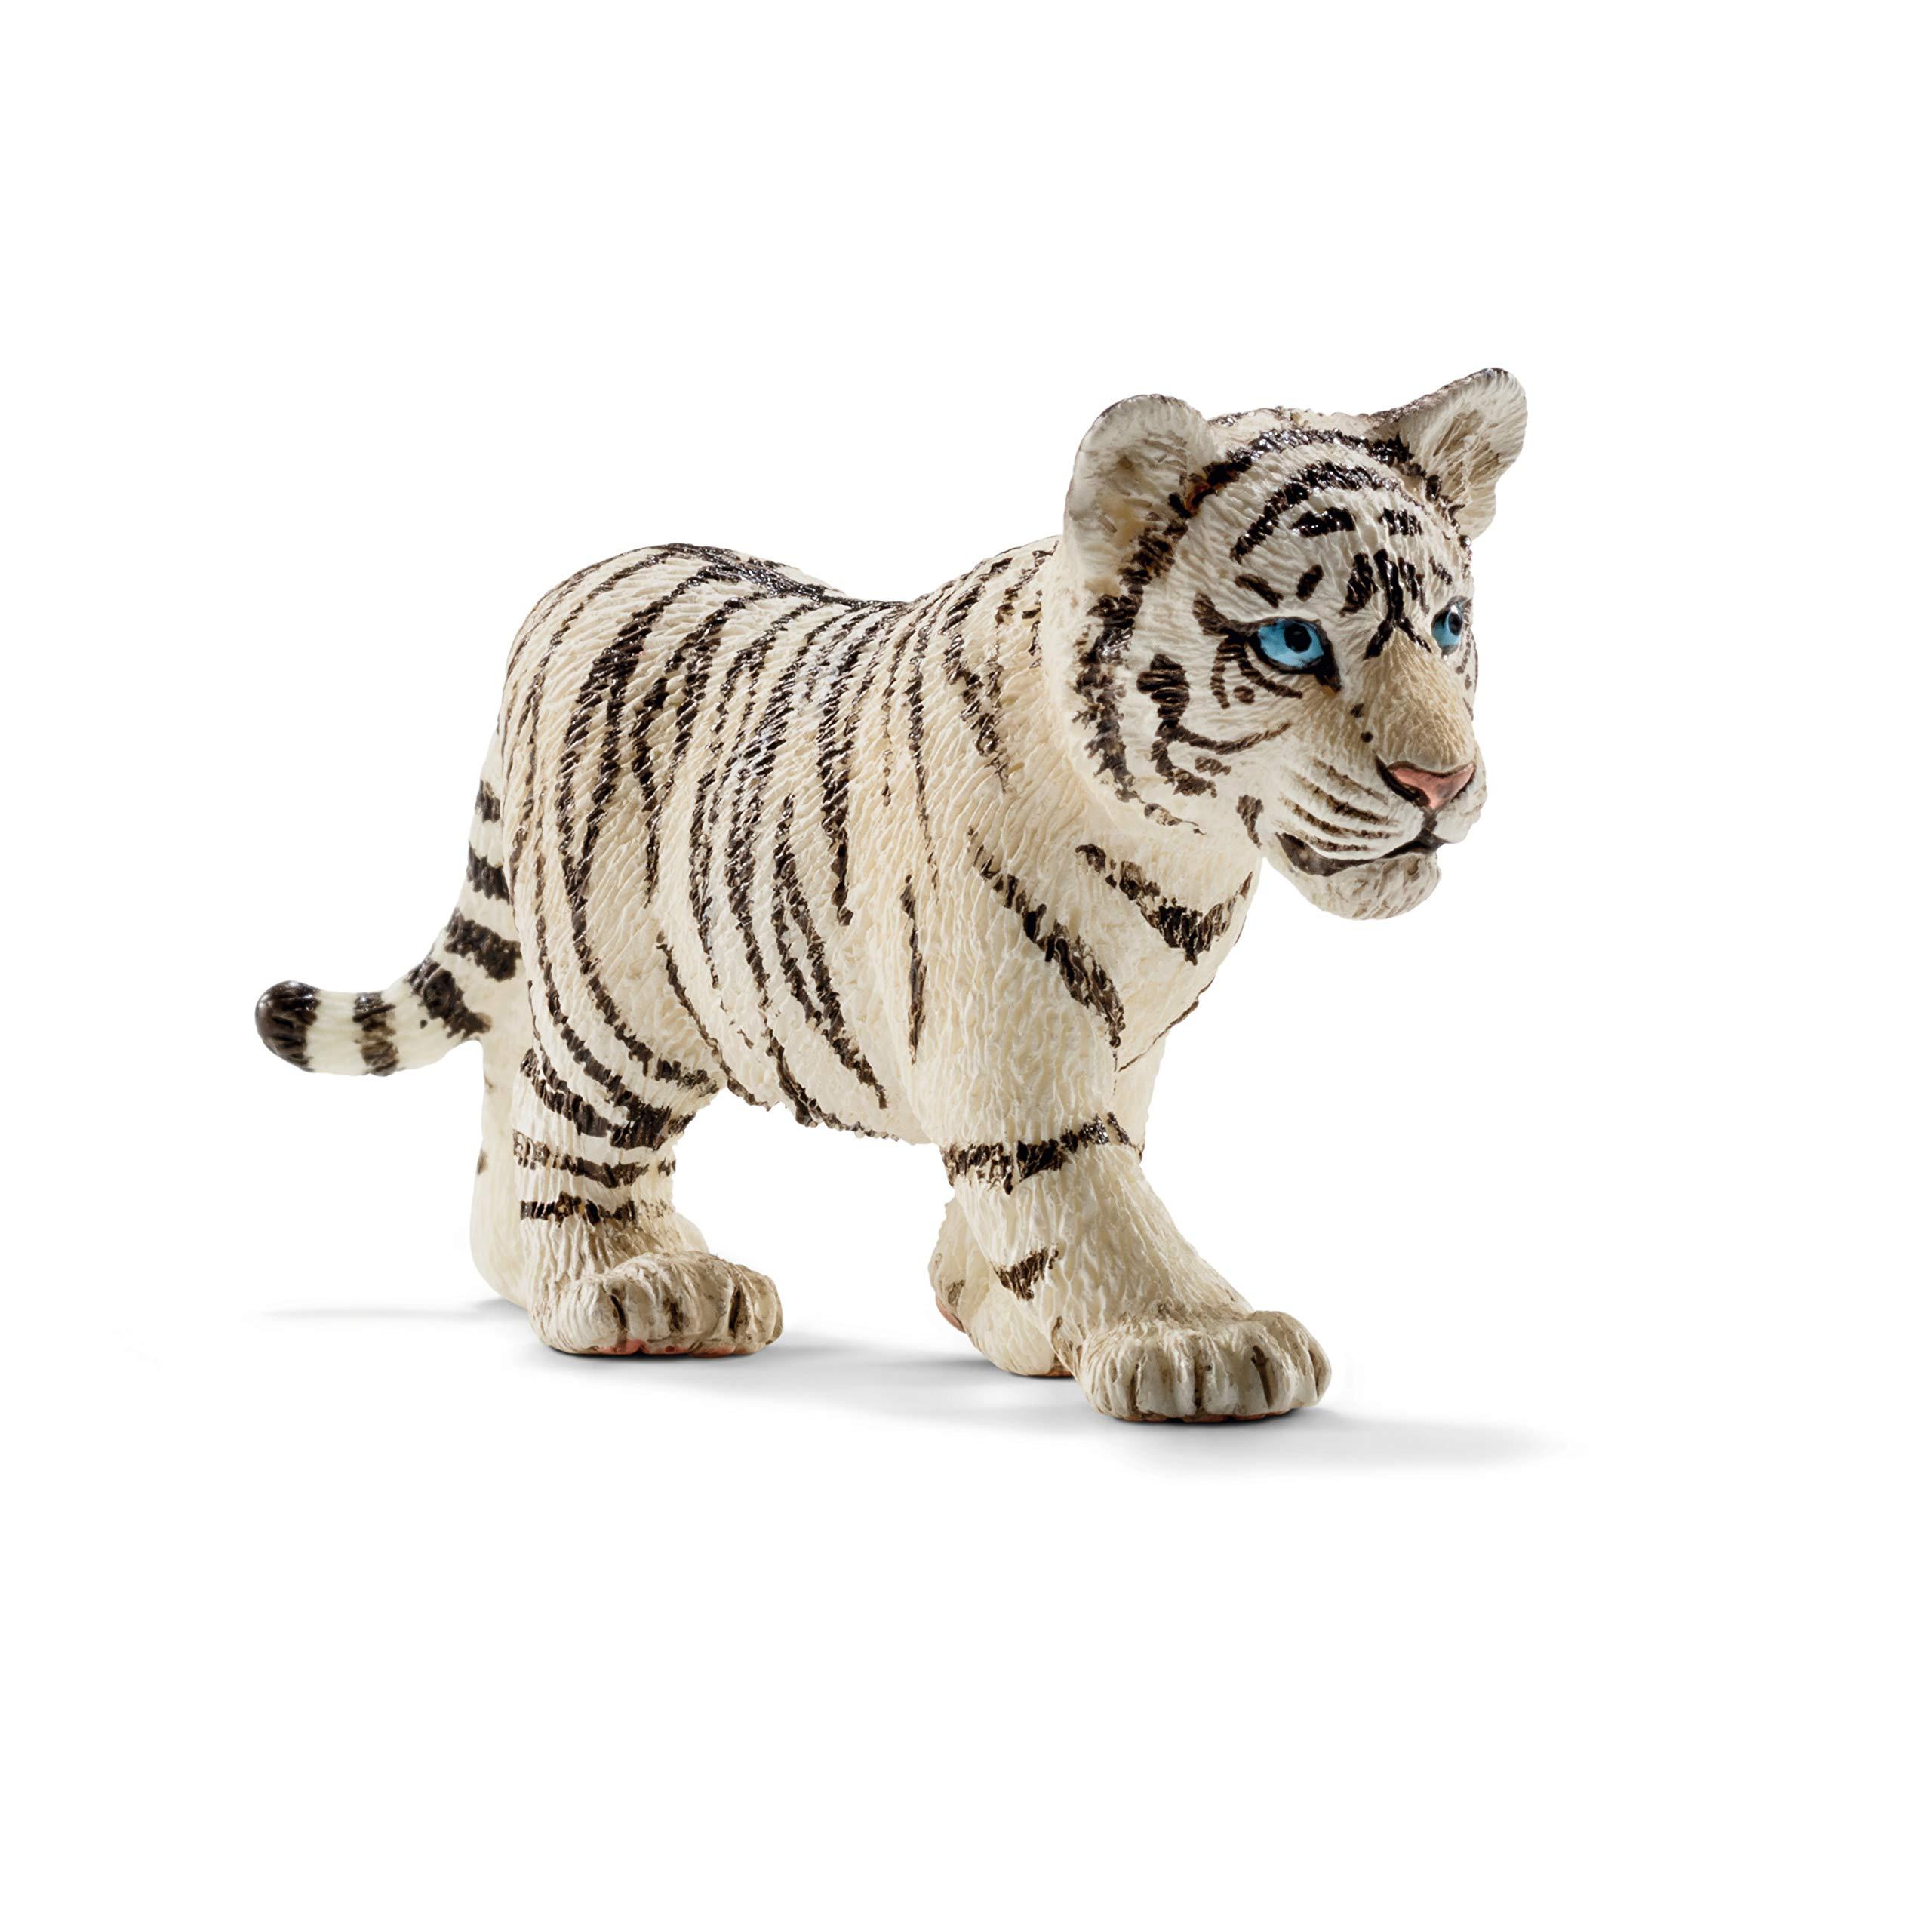 Schleich 14732 Tiger Cub